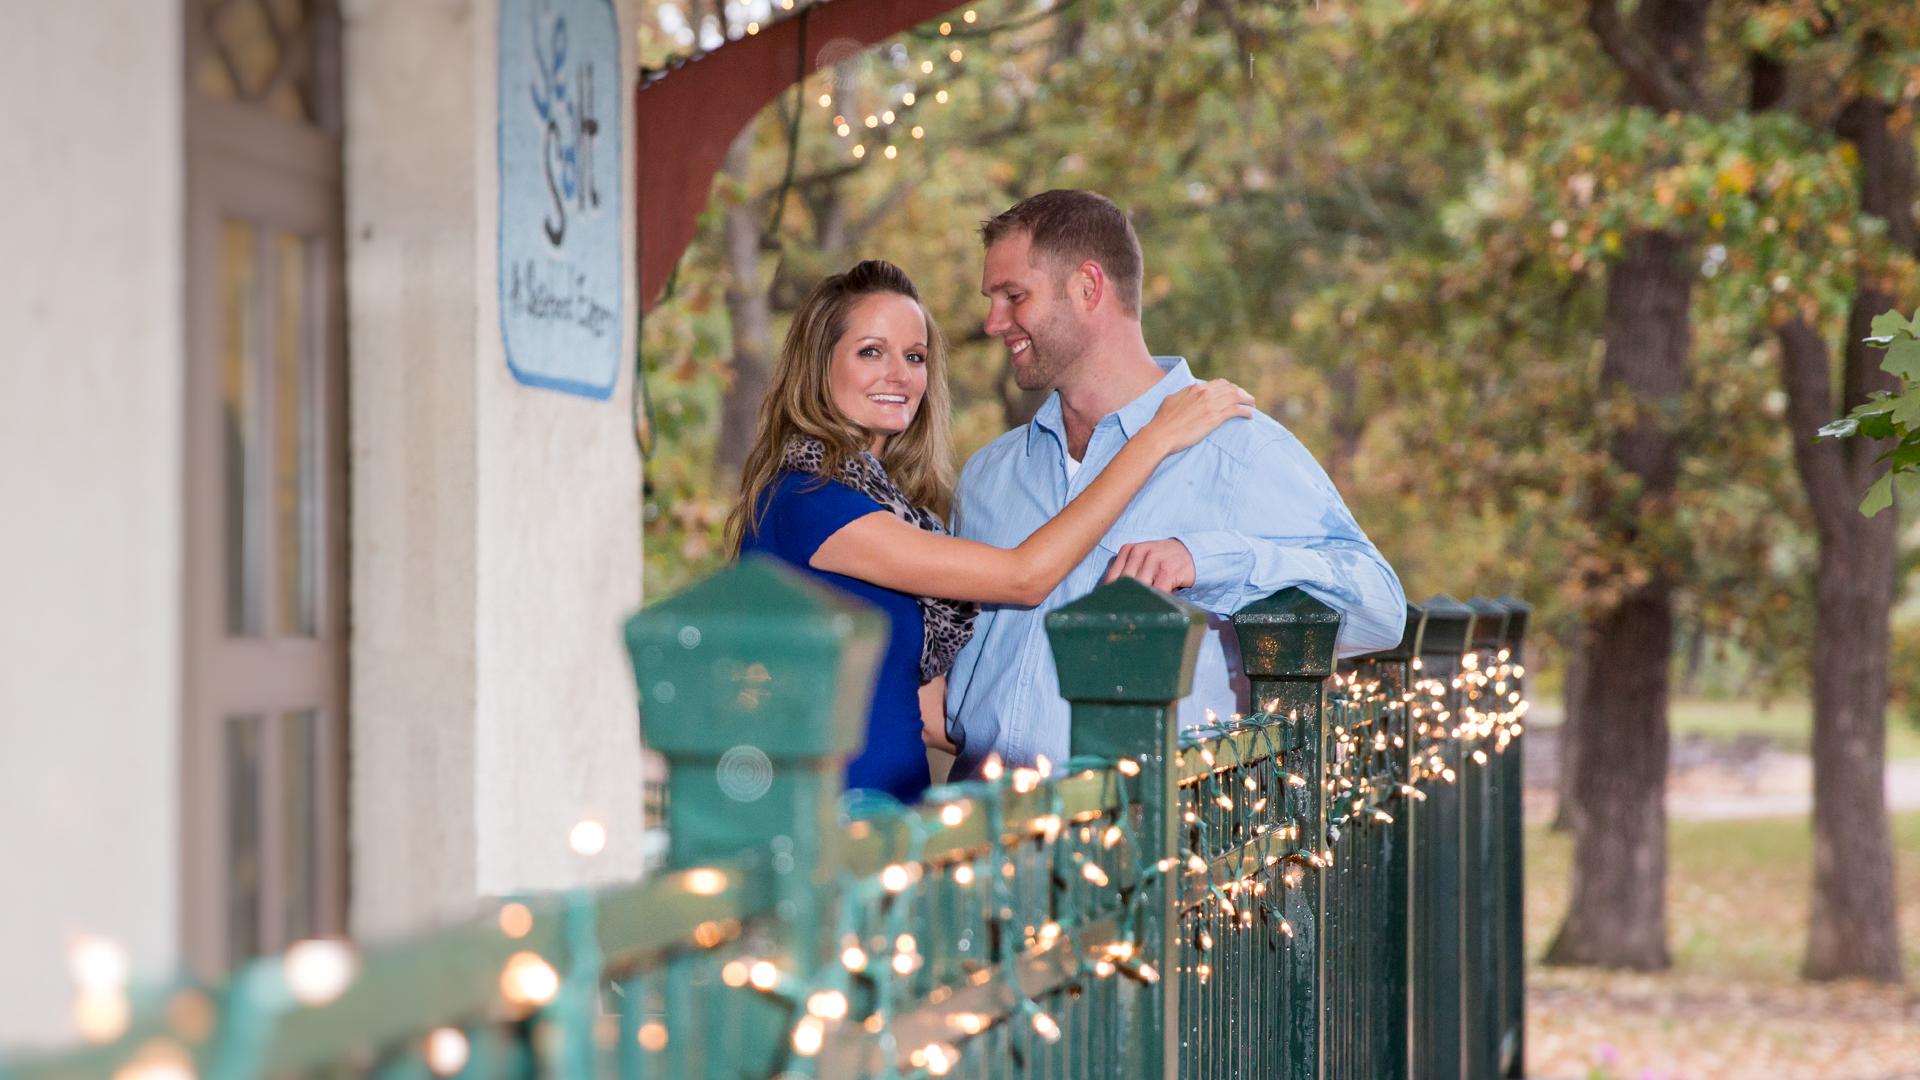 Minnehaha Park Engagement Photographer MN